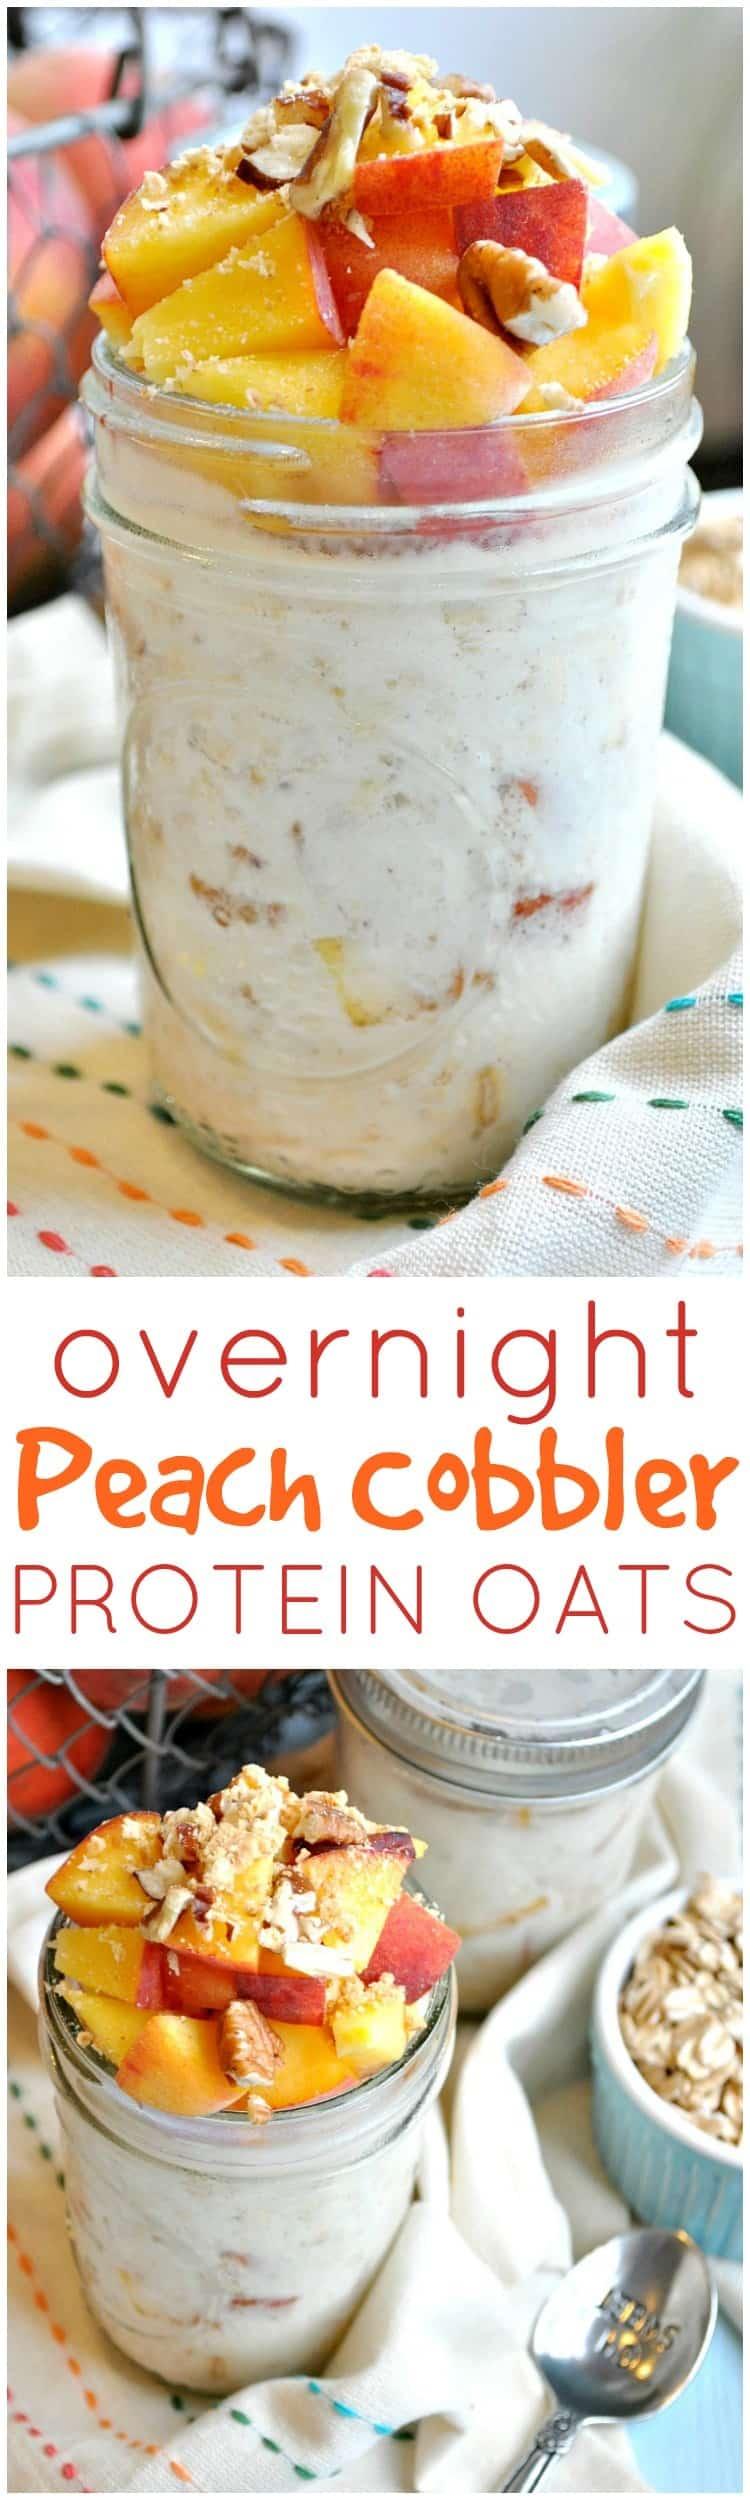 Overnight Peach Cobbler Protein Oats